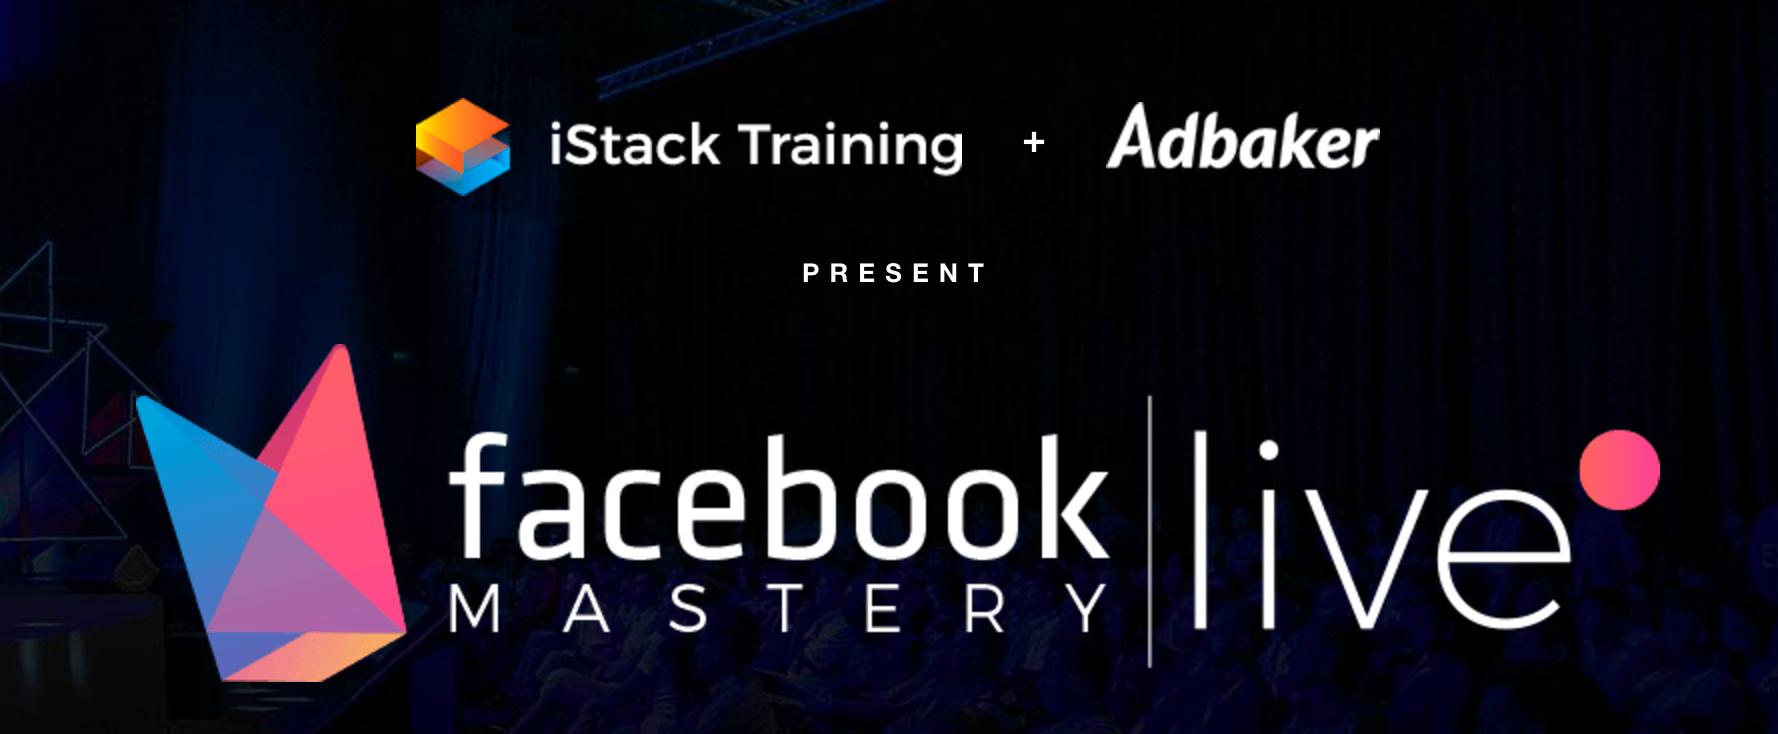 iStack Training